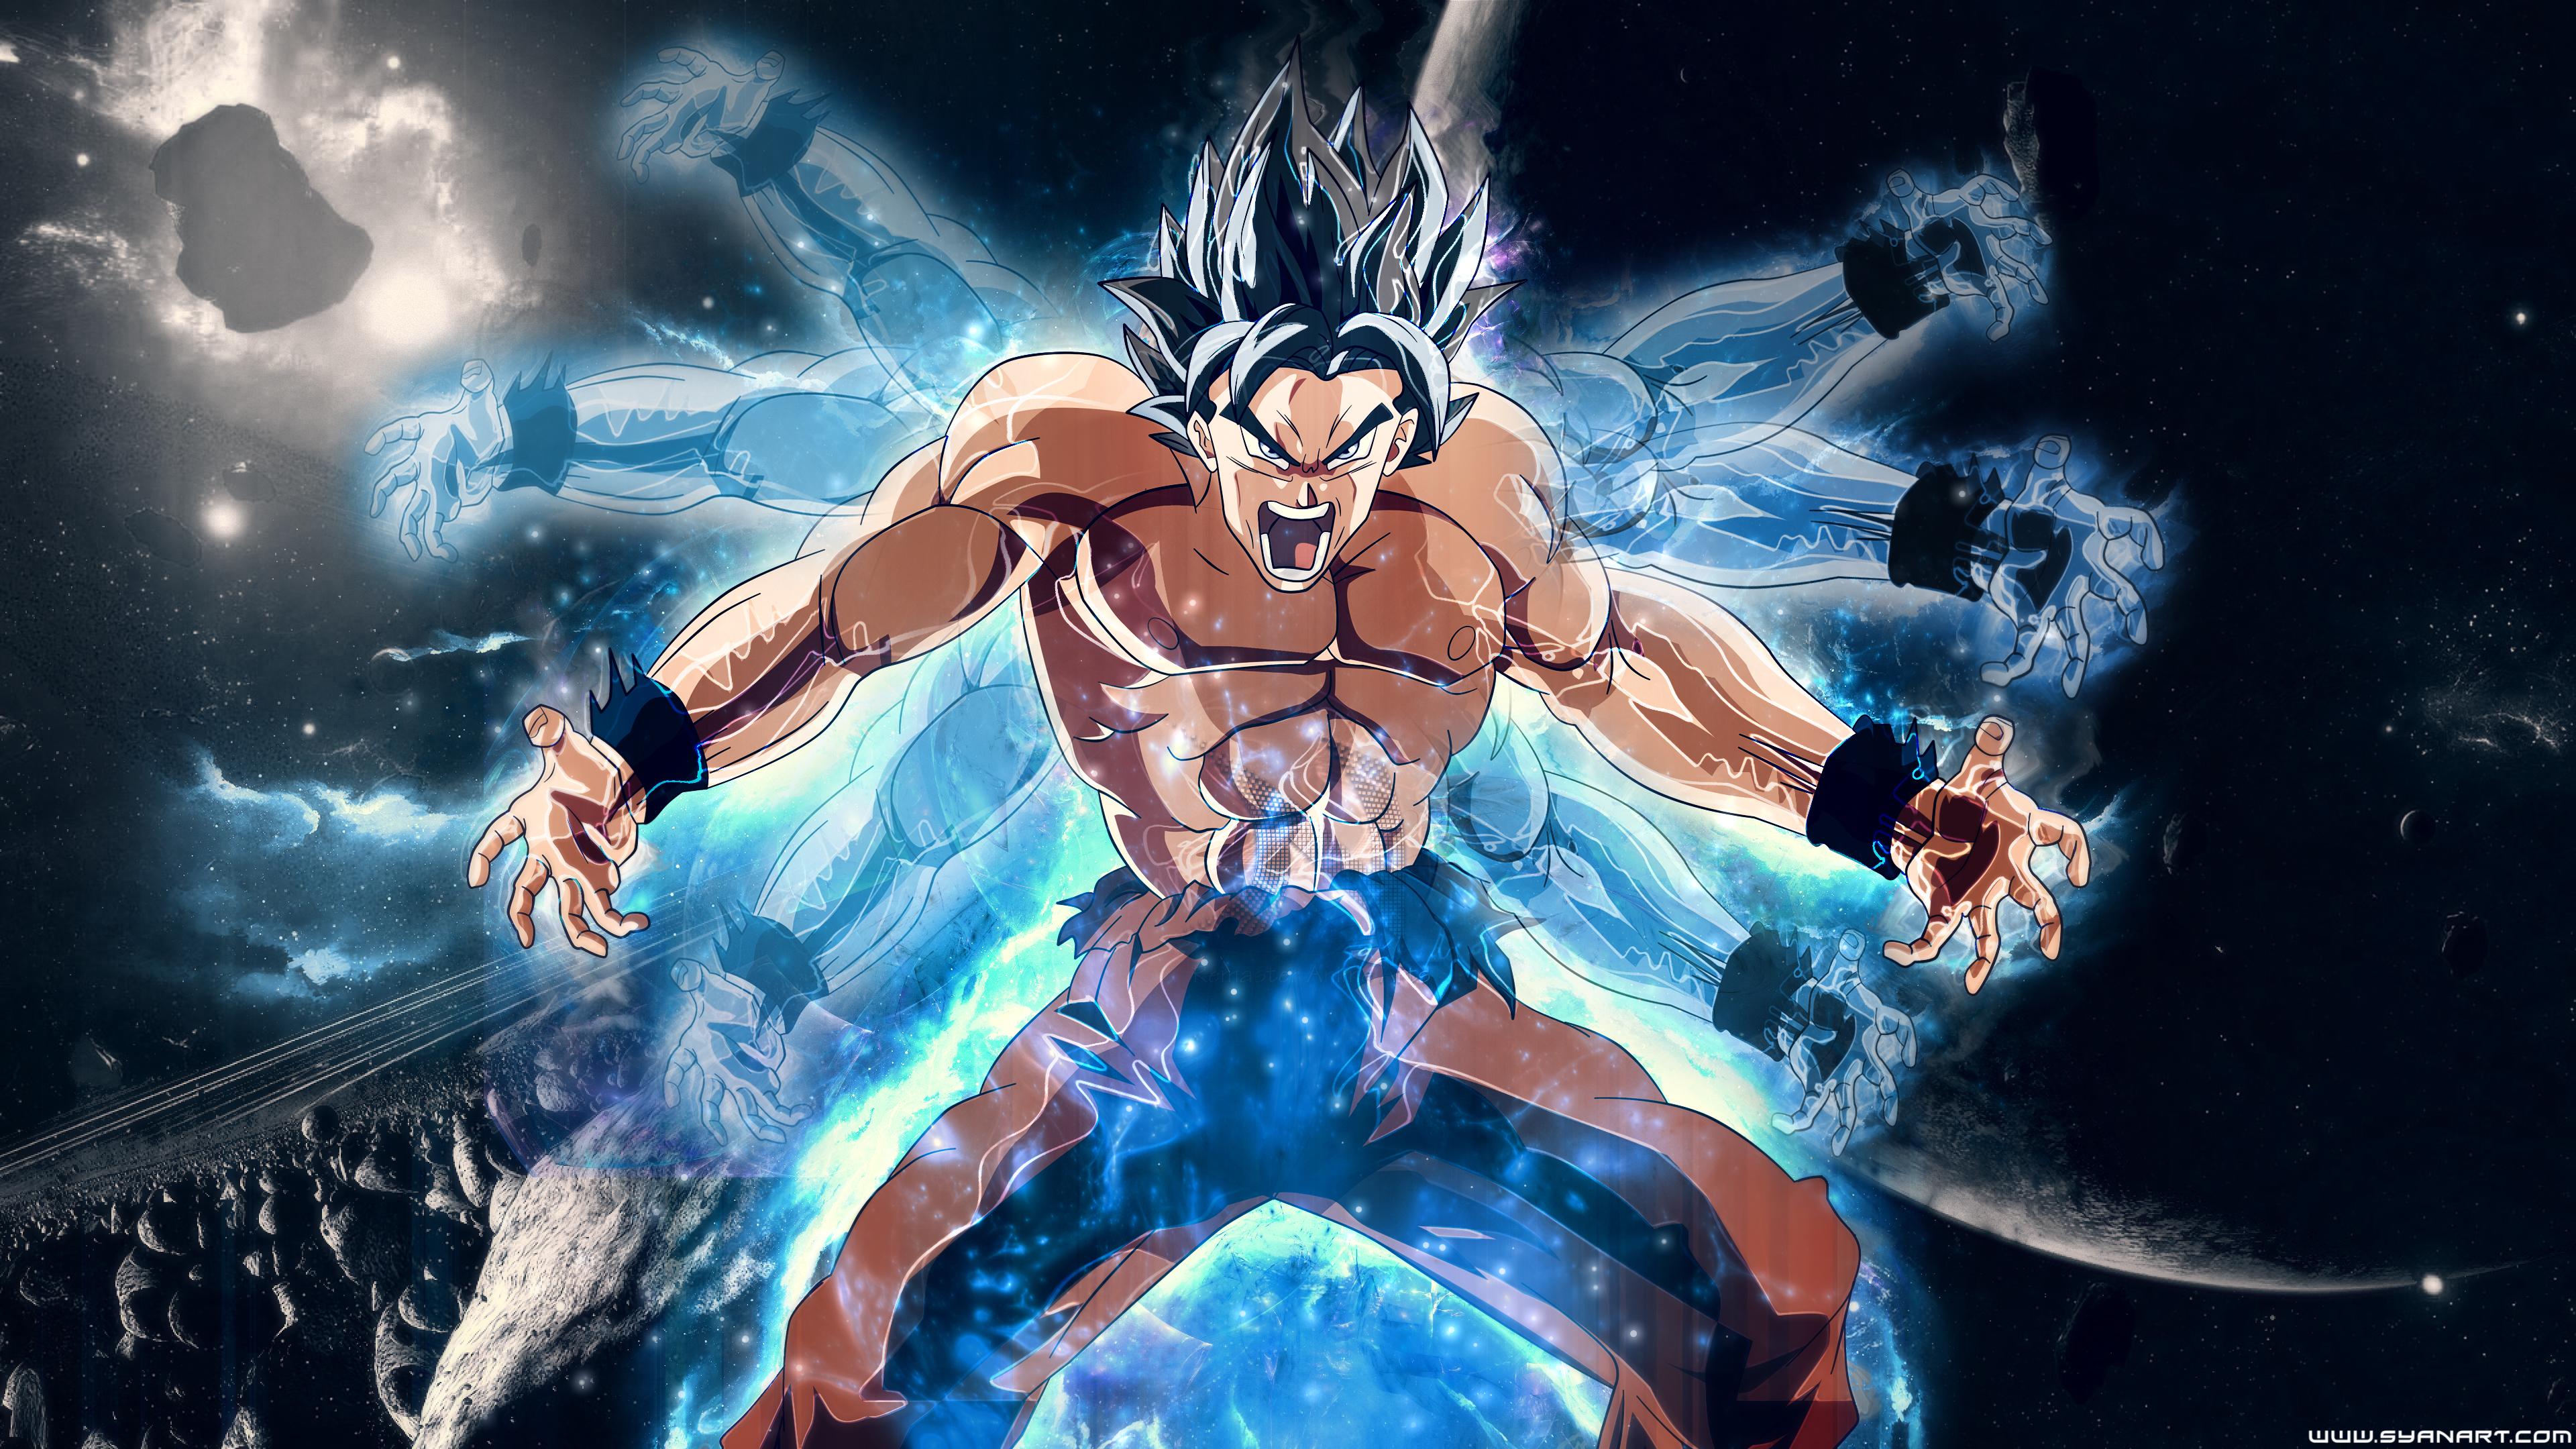 Dragon ball super goku 4k hd anime 4k wallpapers images - Vegeta wallpaper 4k for pc ...